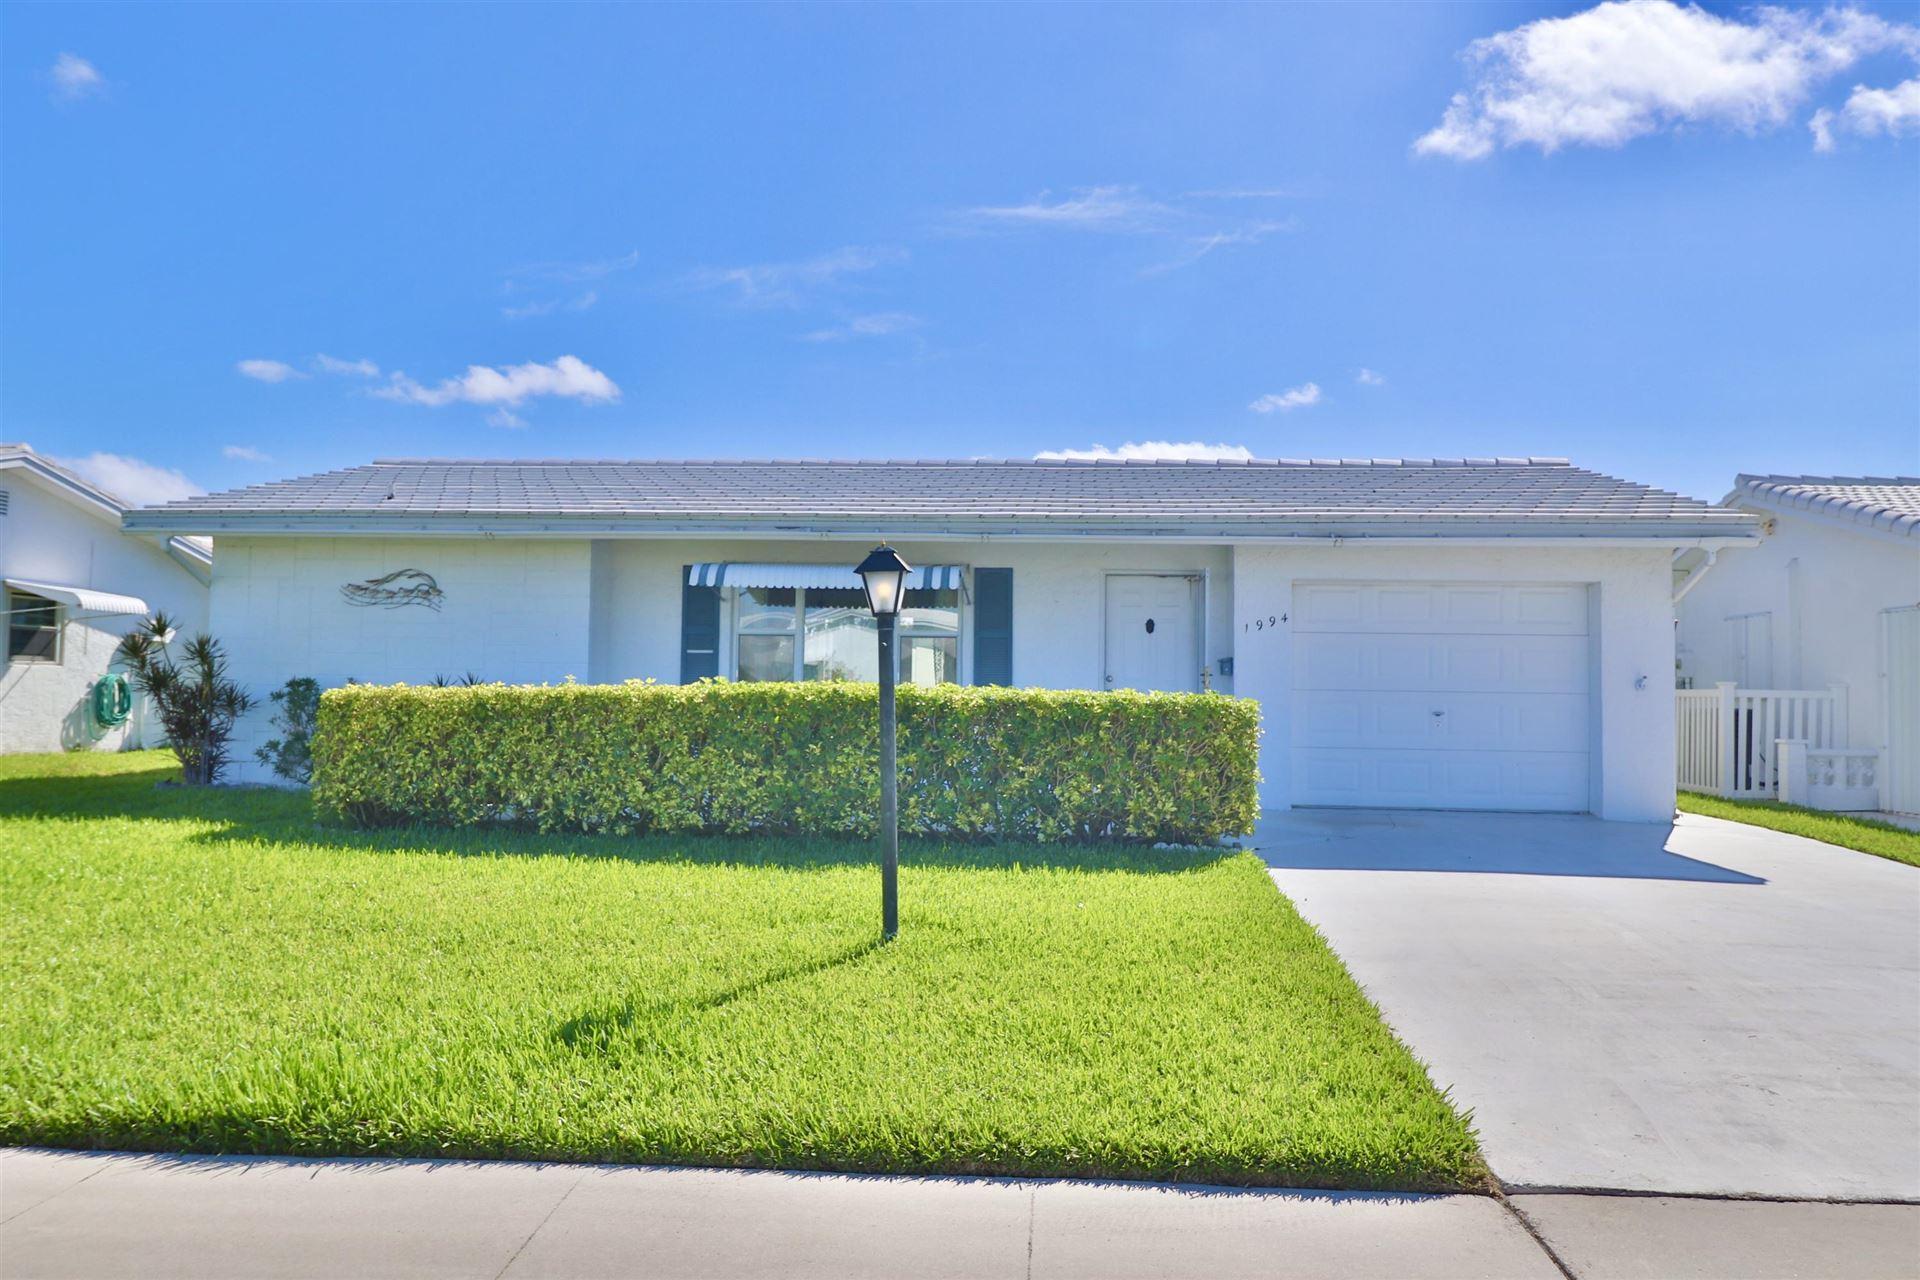 1994 Campanelli Boulevard, Boynton Beach, FL 33426 - MLS#: RX-10709879